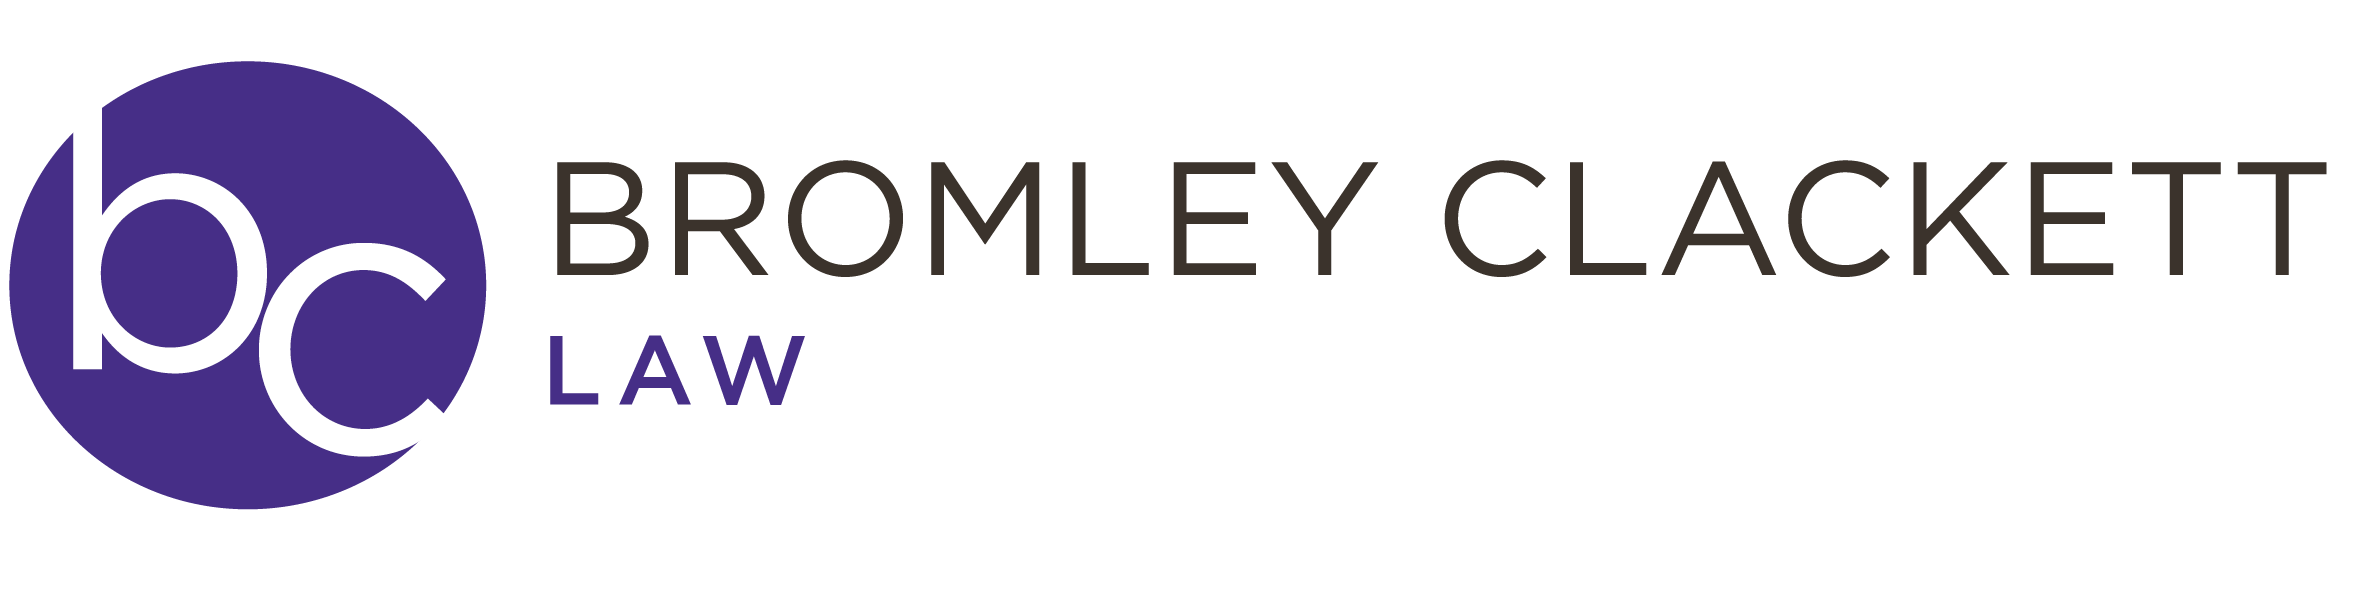 Bromley Clackett Law